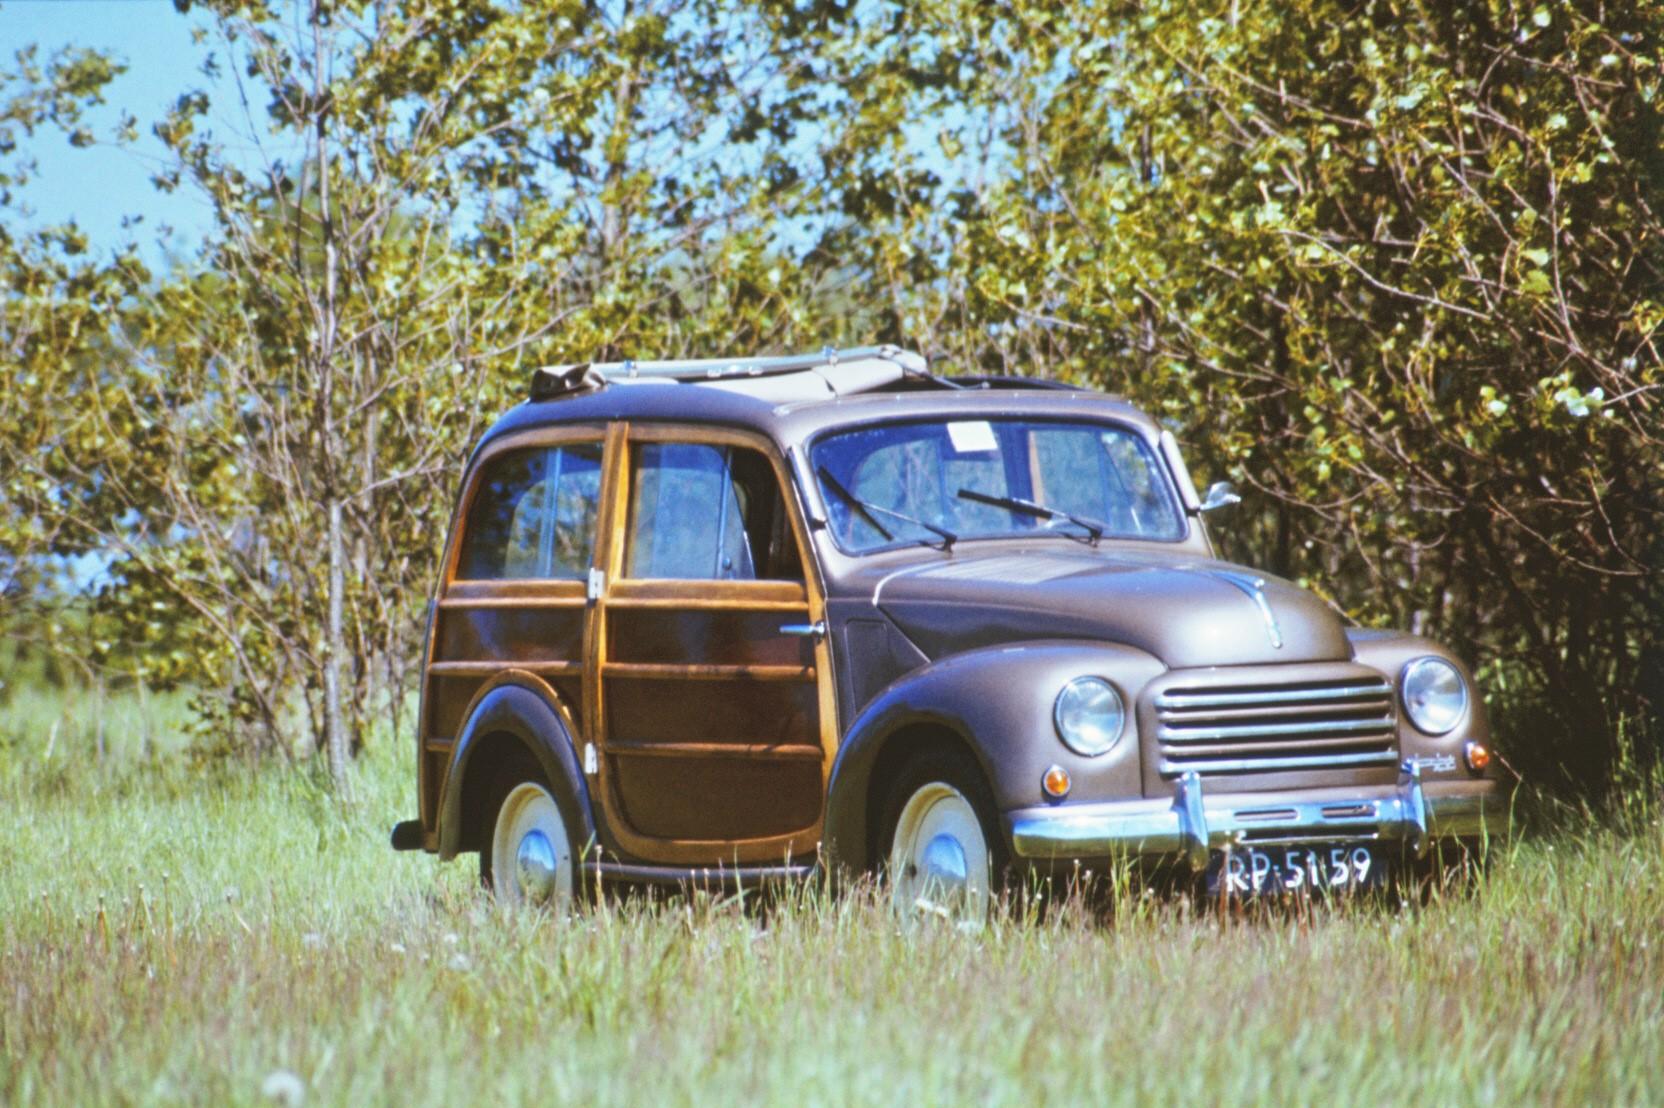 file:1949 fiat topolino c giardiniera - flickr - joost j. bakker